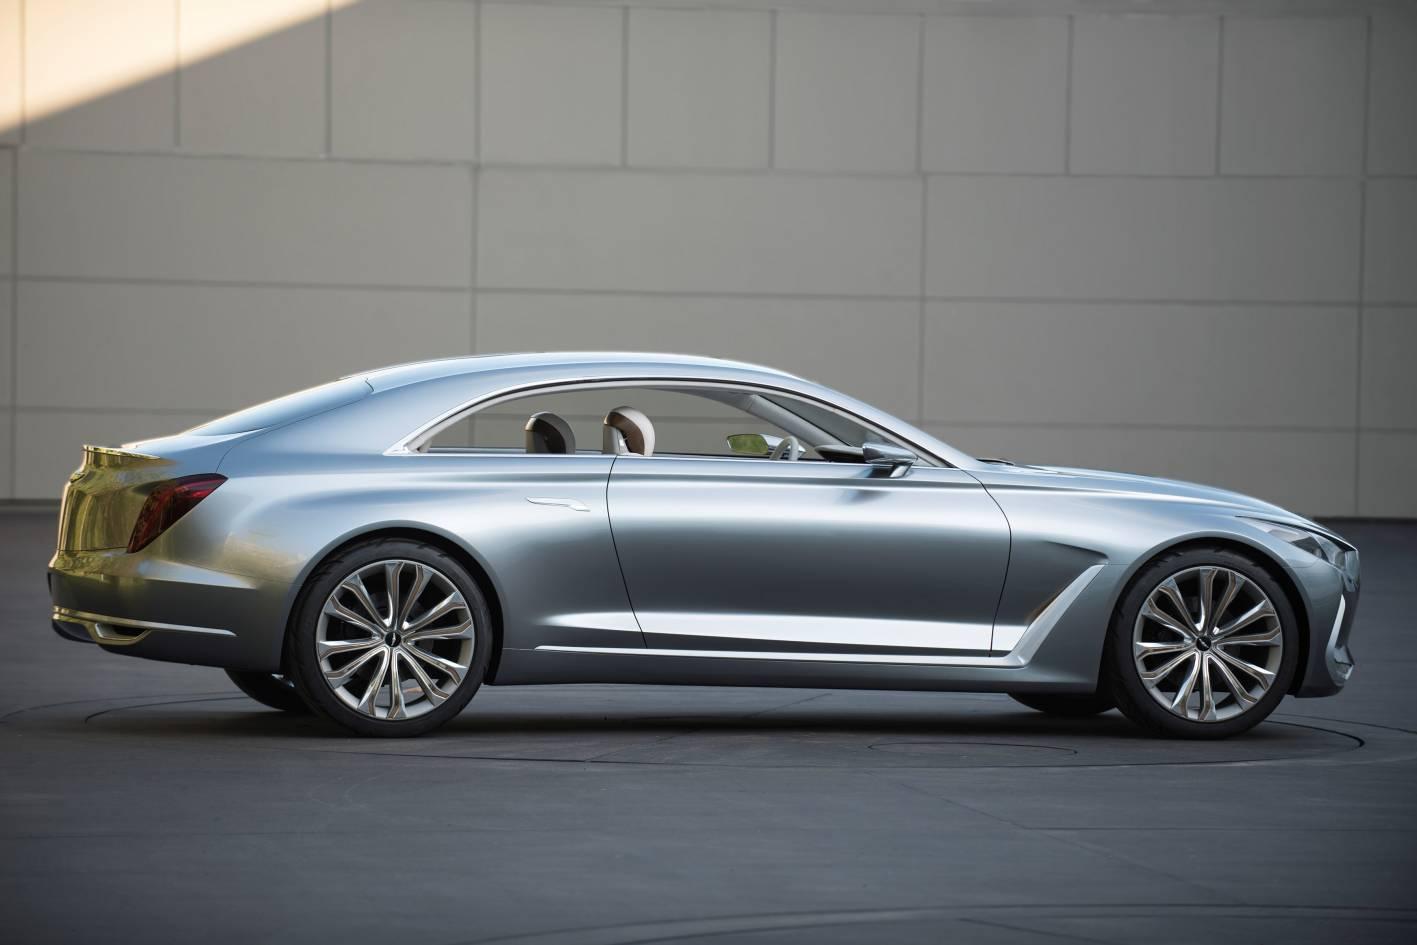 Car Museum Los Angeles >> Hyundai Vision G Concept Coupe unveiled | PerformanceDrive